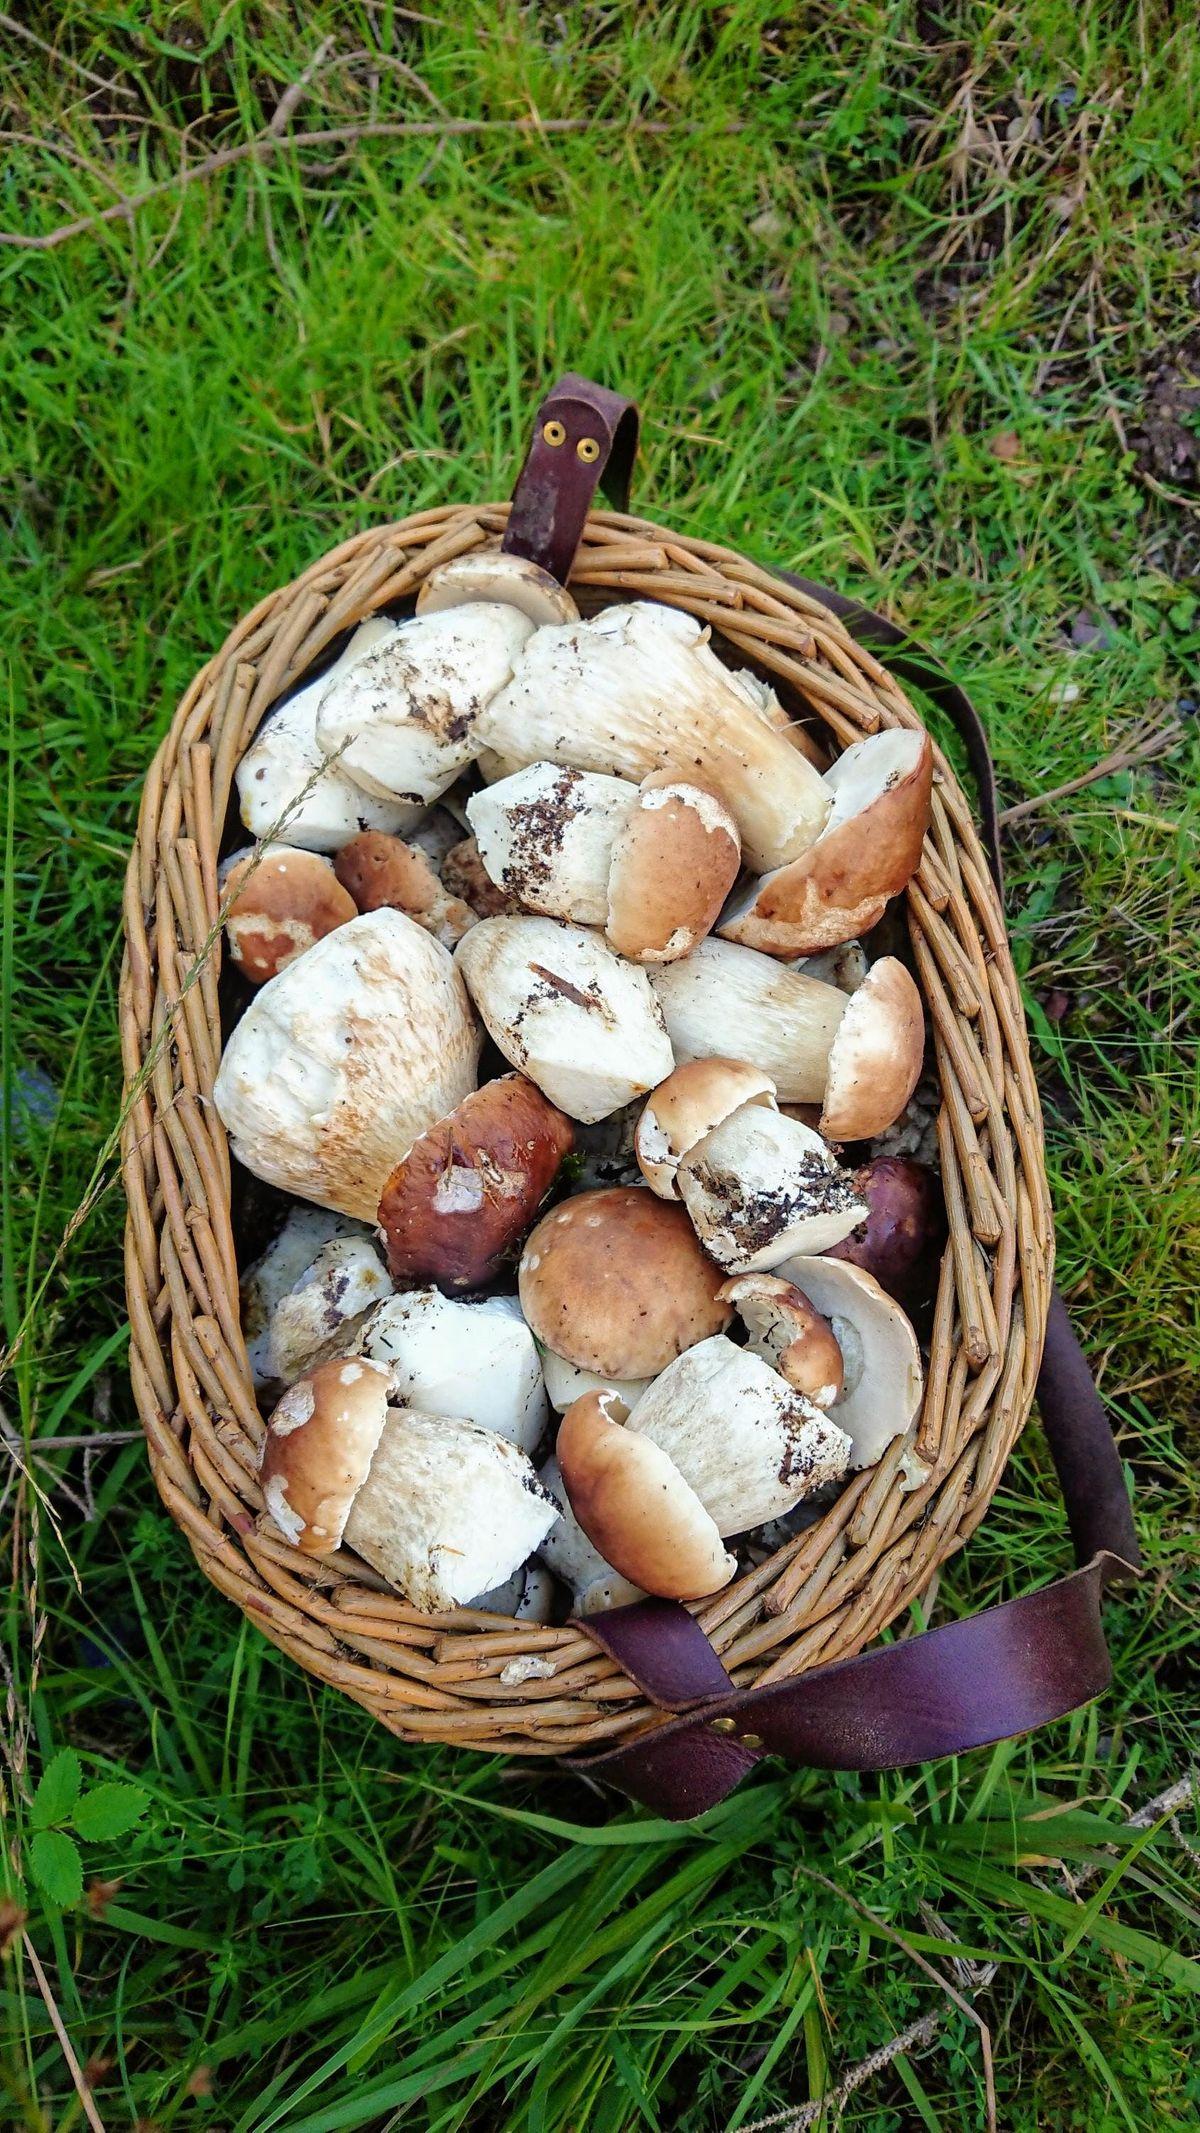 Ballyhoura Mountain Mushrooms Mushroom Forage on Sunday September 22nd